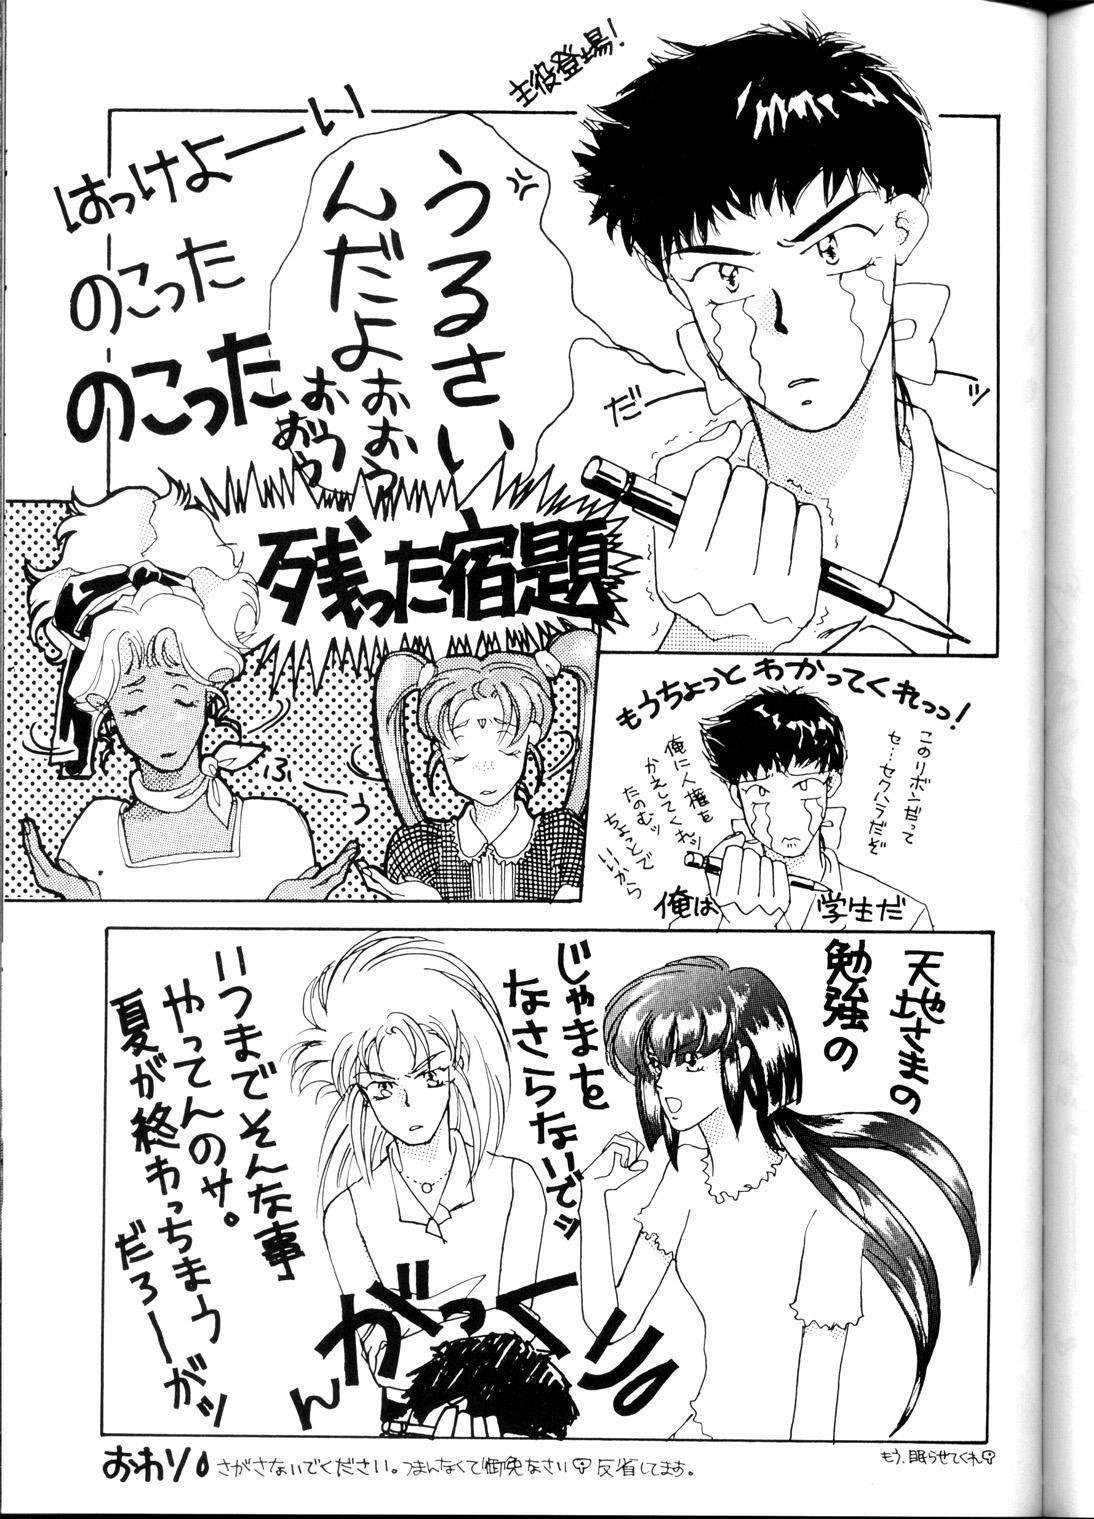 [B.B.C] Tenchi Muyou! Ryou-ou-ki Kaiteiben (Tenchi Muyou!) 53